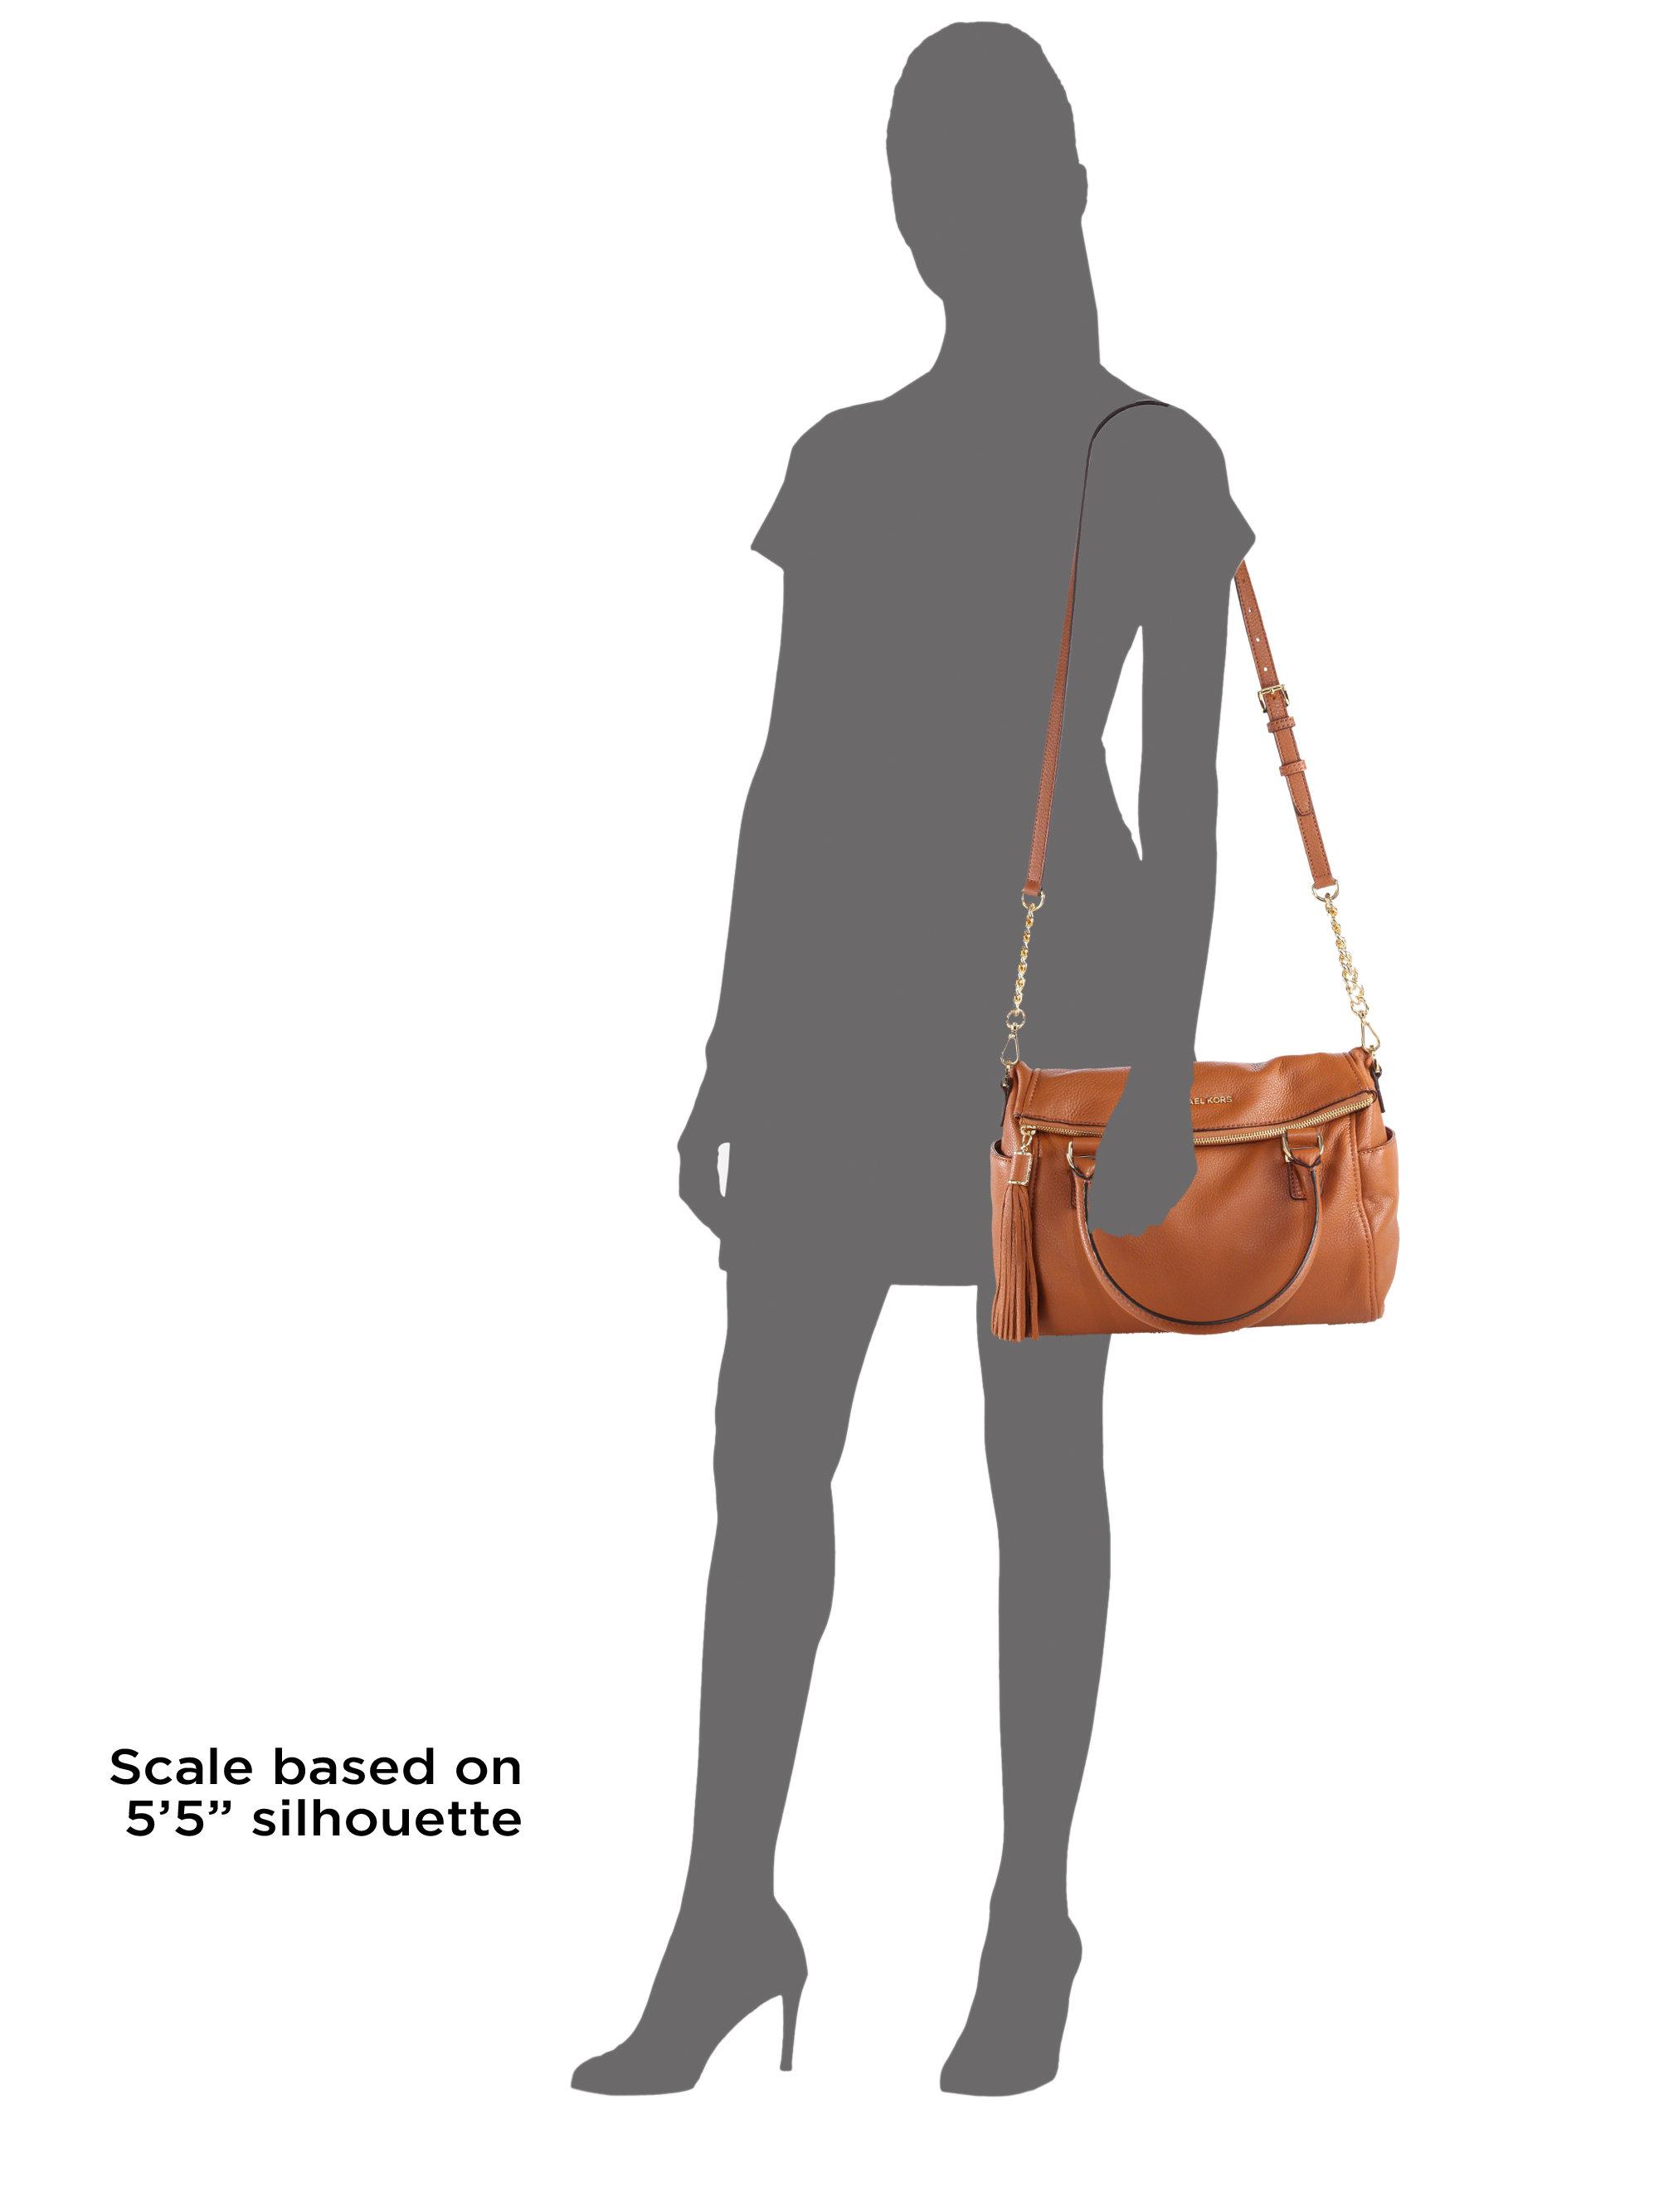 af02883422d1 ... buy lyst michael michael kors weston medium satchel in brown 69a52 89c4d